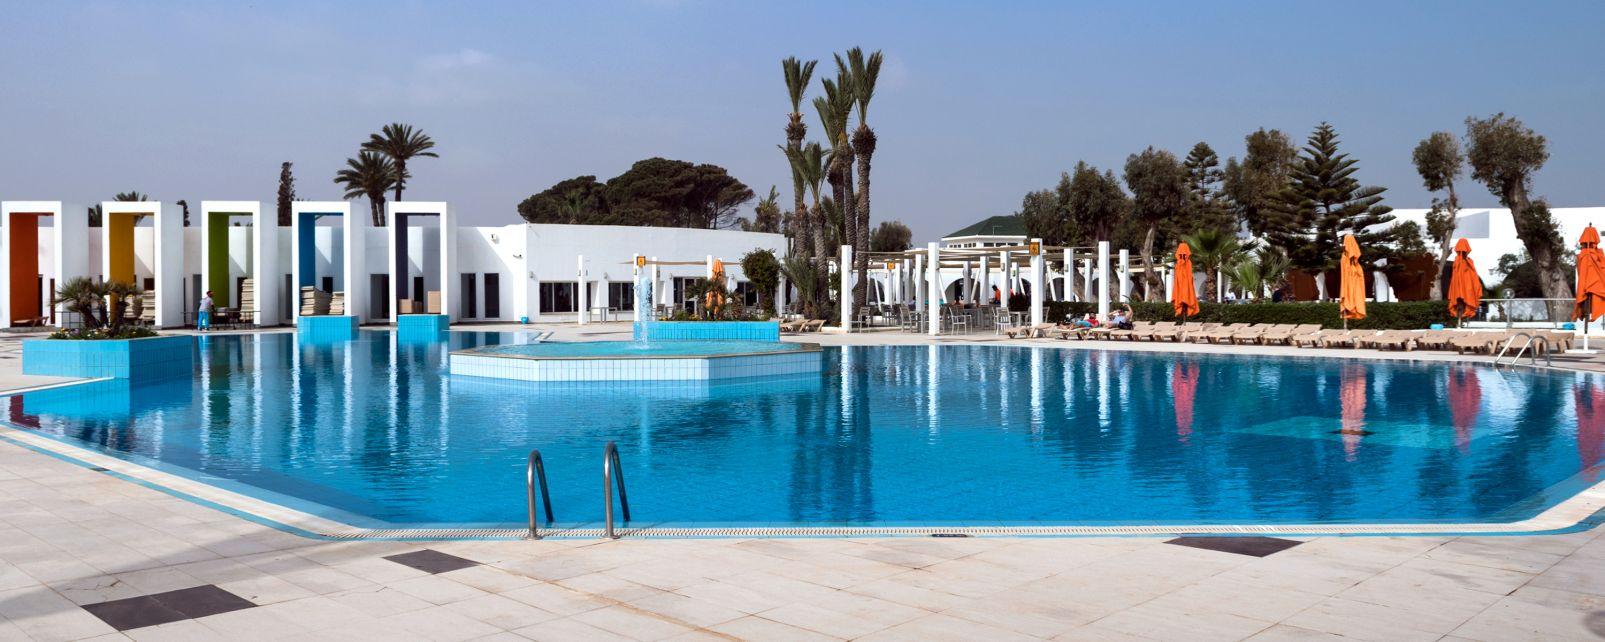 Hôtel One Resort Aquapark and Spa